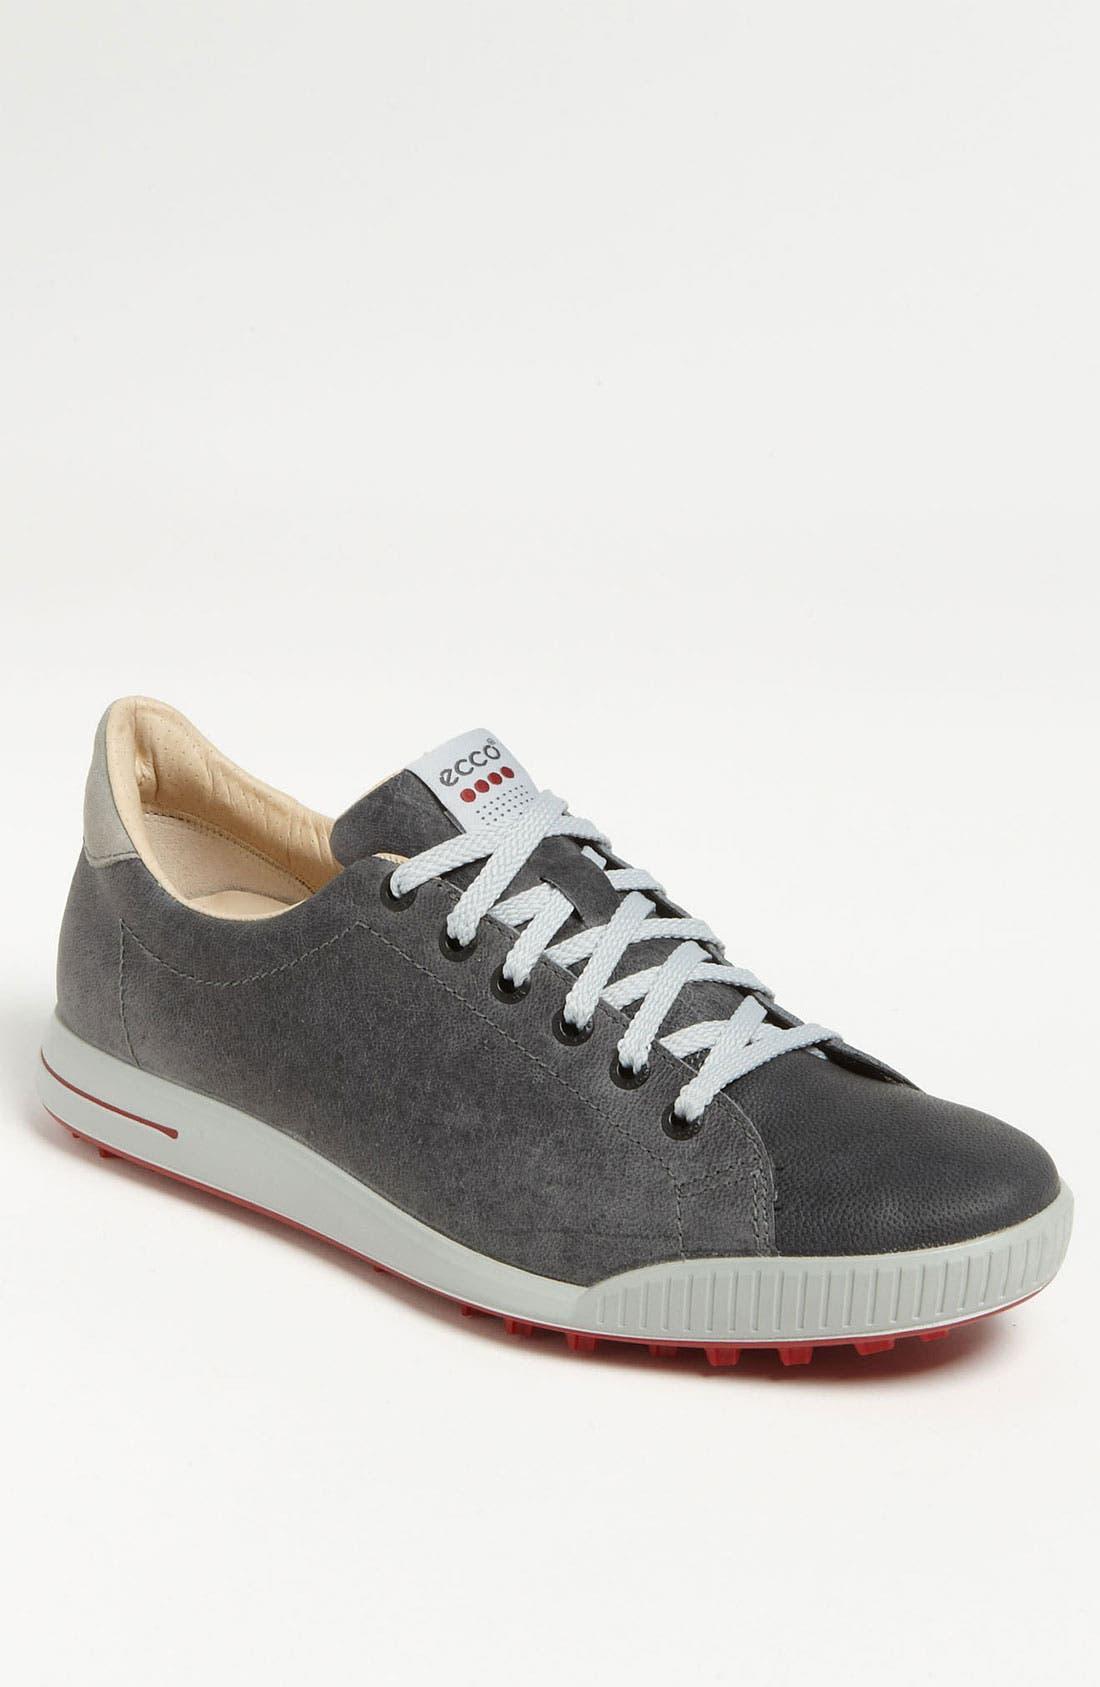 Alternate Image 1 Selected - ECCO 'Golf Street' Sneaker